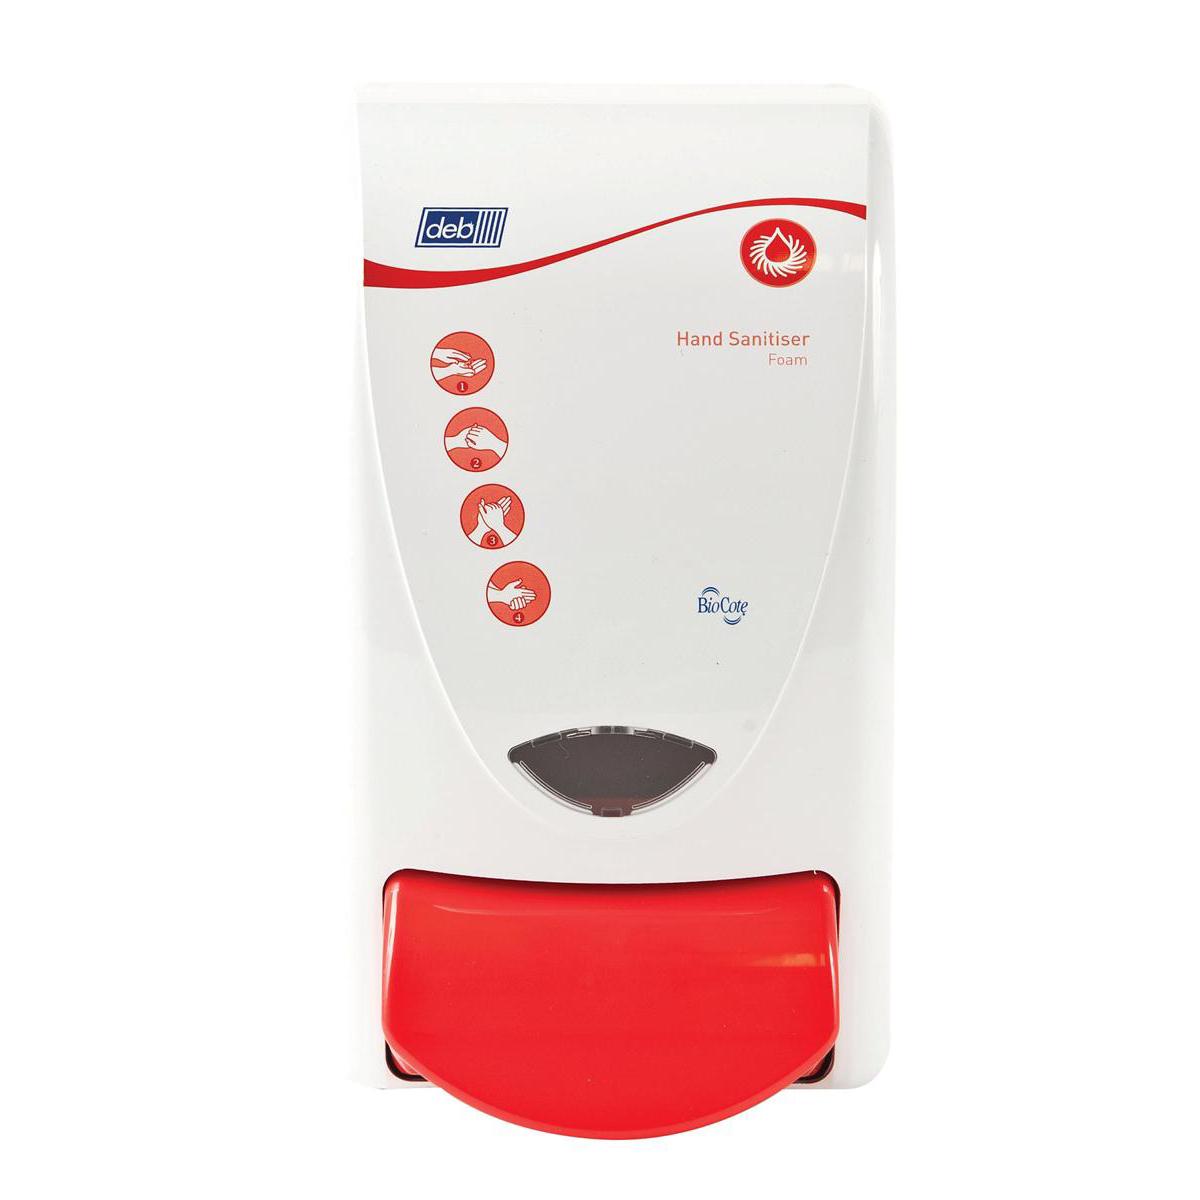 DEB Instant Foam Hand Sanitiser Dispenser 1L Ref C00351